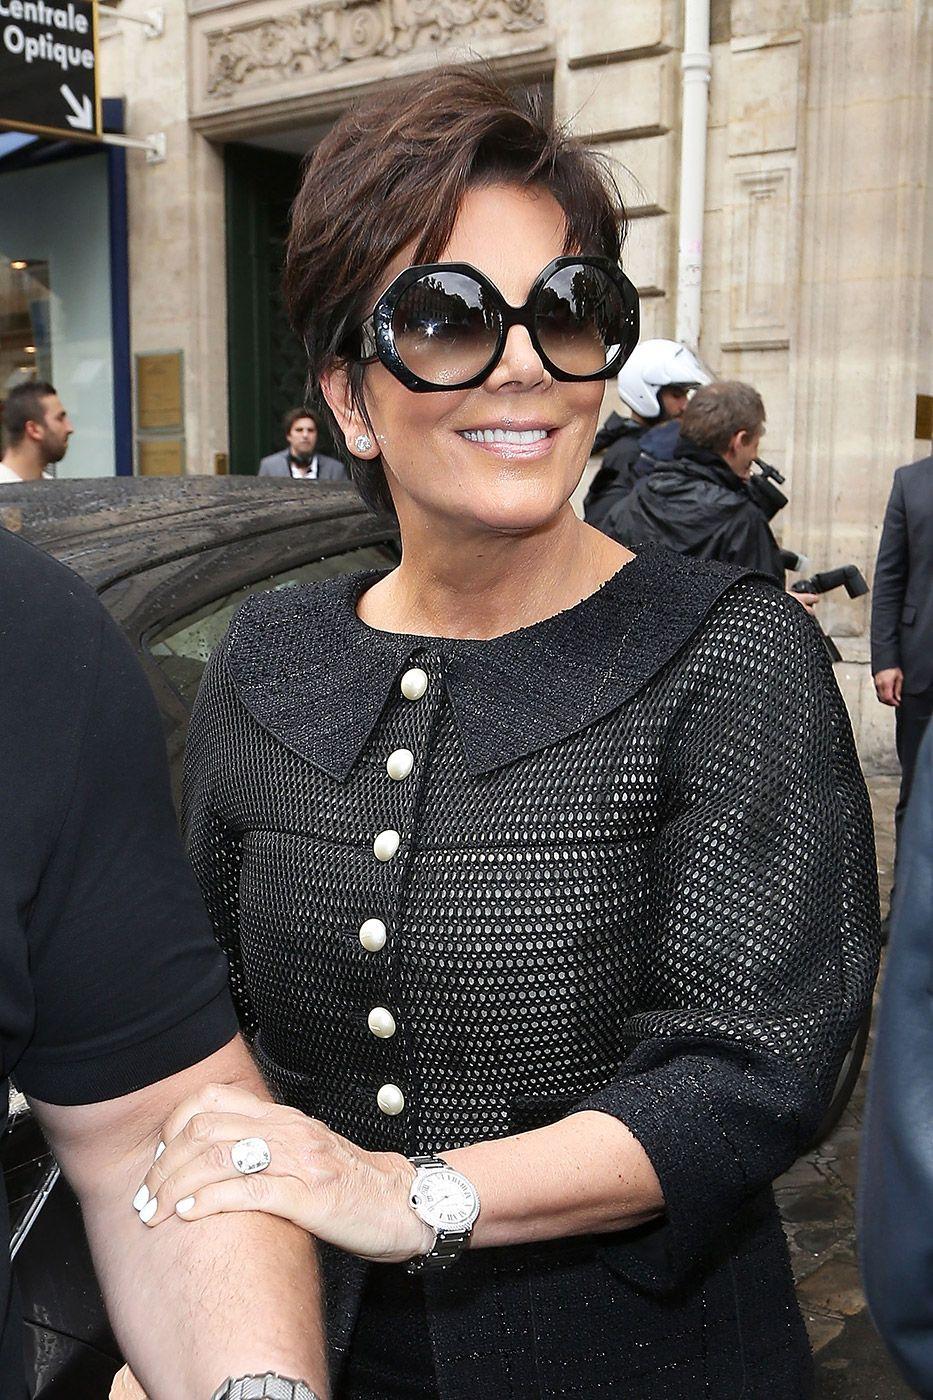 8562745a40ea Kris Jenner over-sized Sunglasses. Kris Jenner over-sized Sunglasses  Kardashian Mom